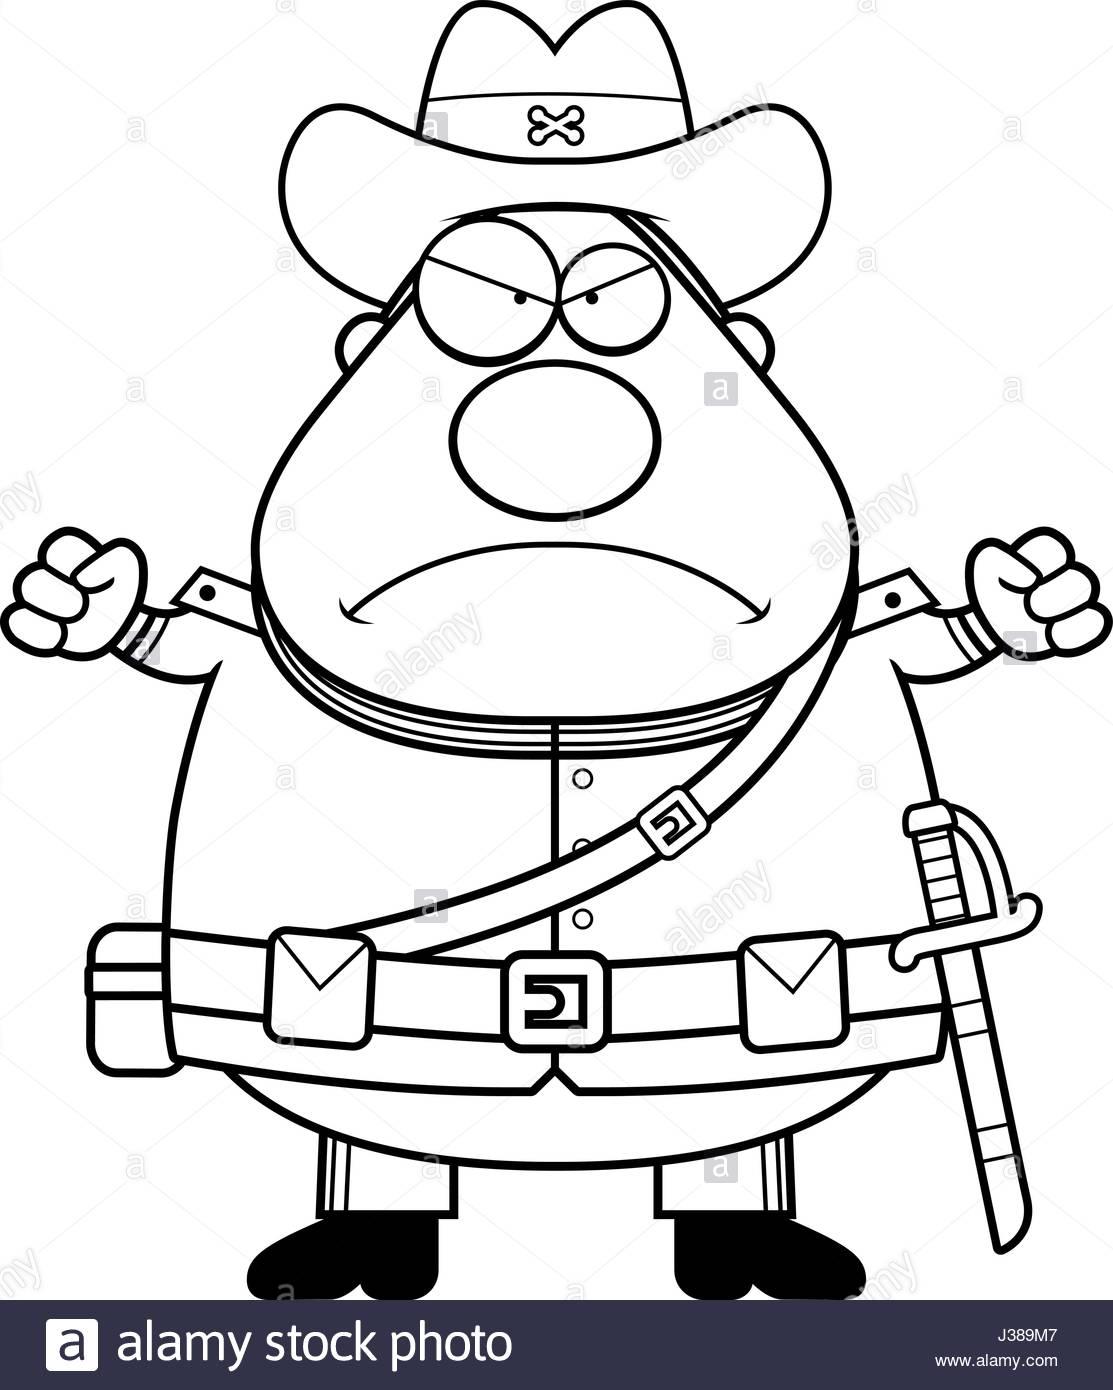 1113x1390 A Cartoon Illustration Of A Civil War Confederate Soldier Looking